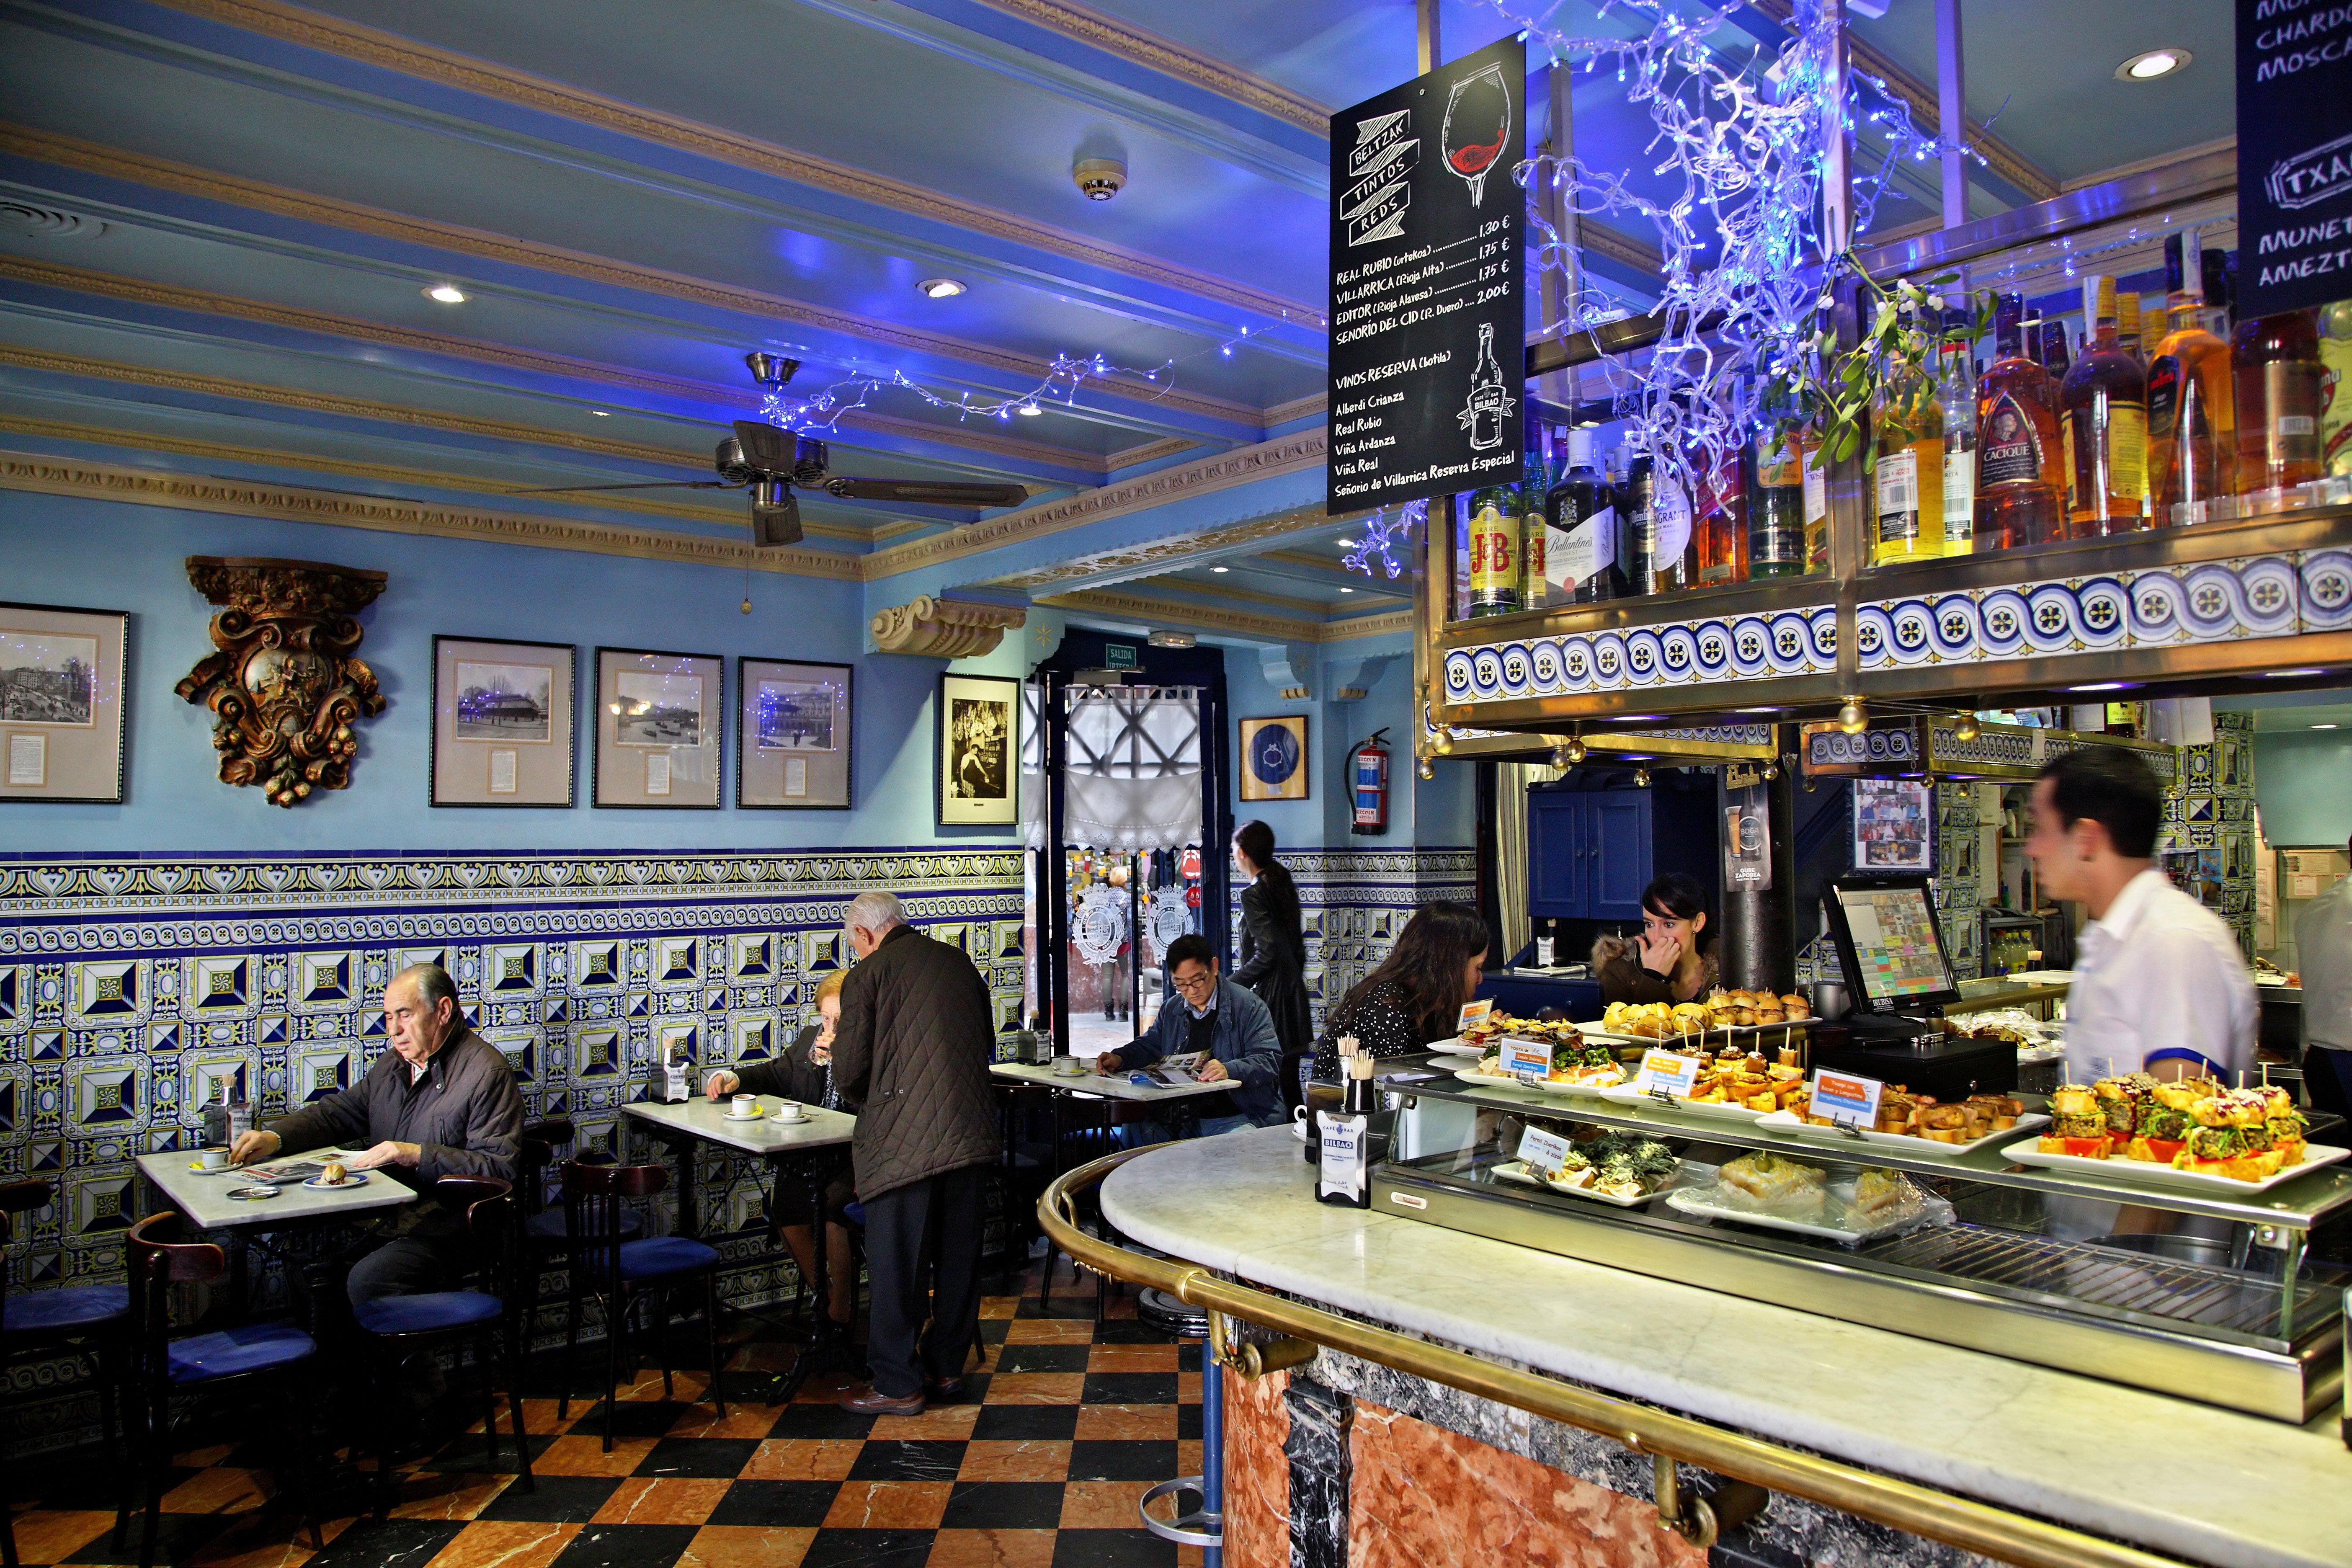 Bar de Bilbao || Fuente: Shutterstock